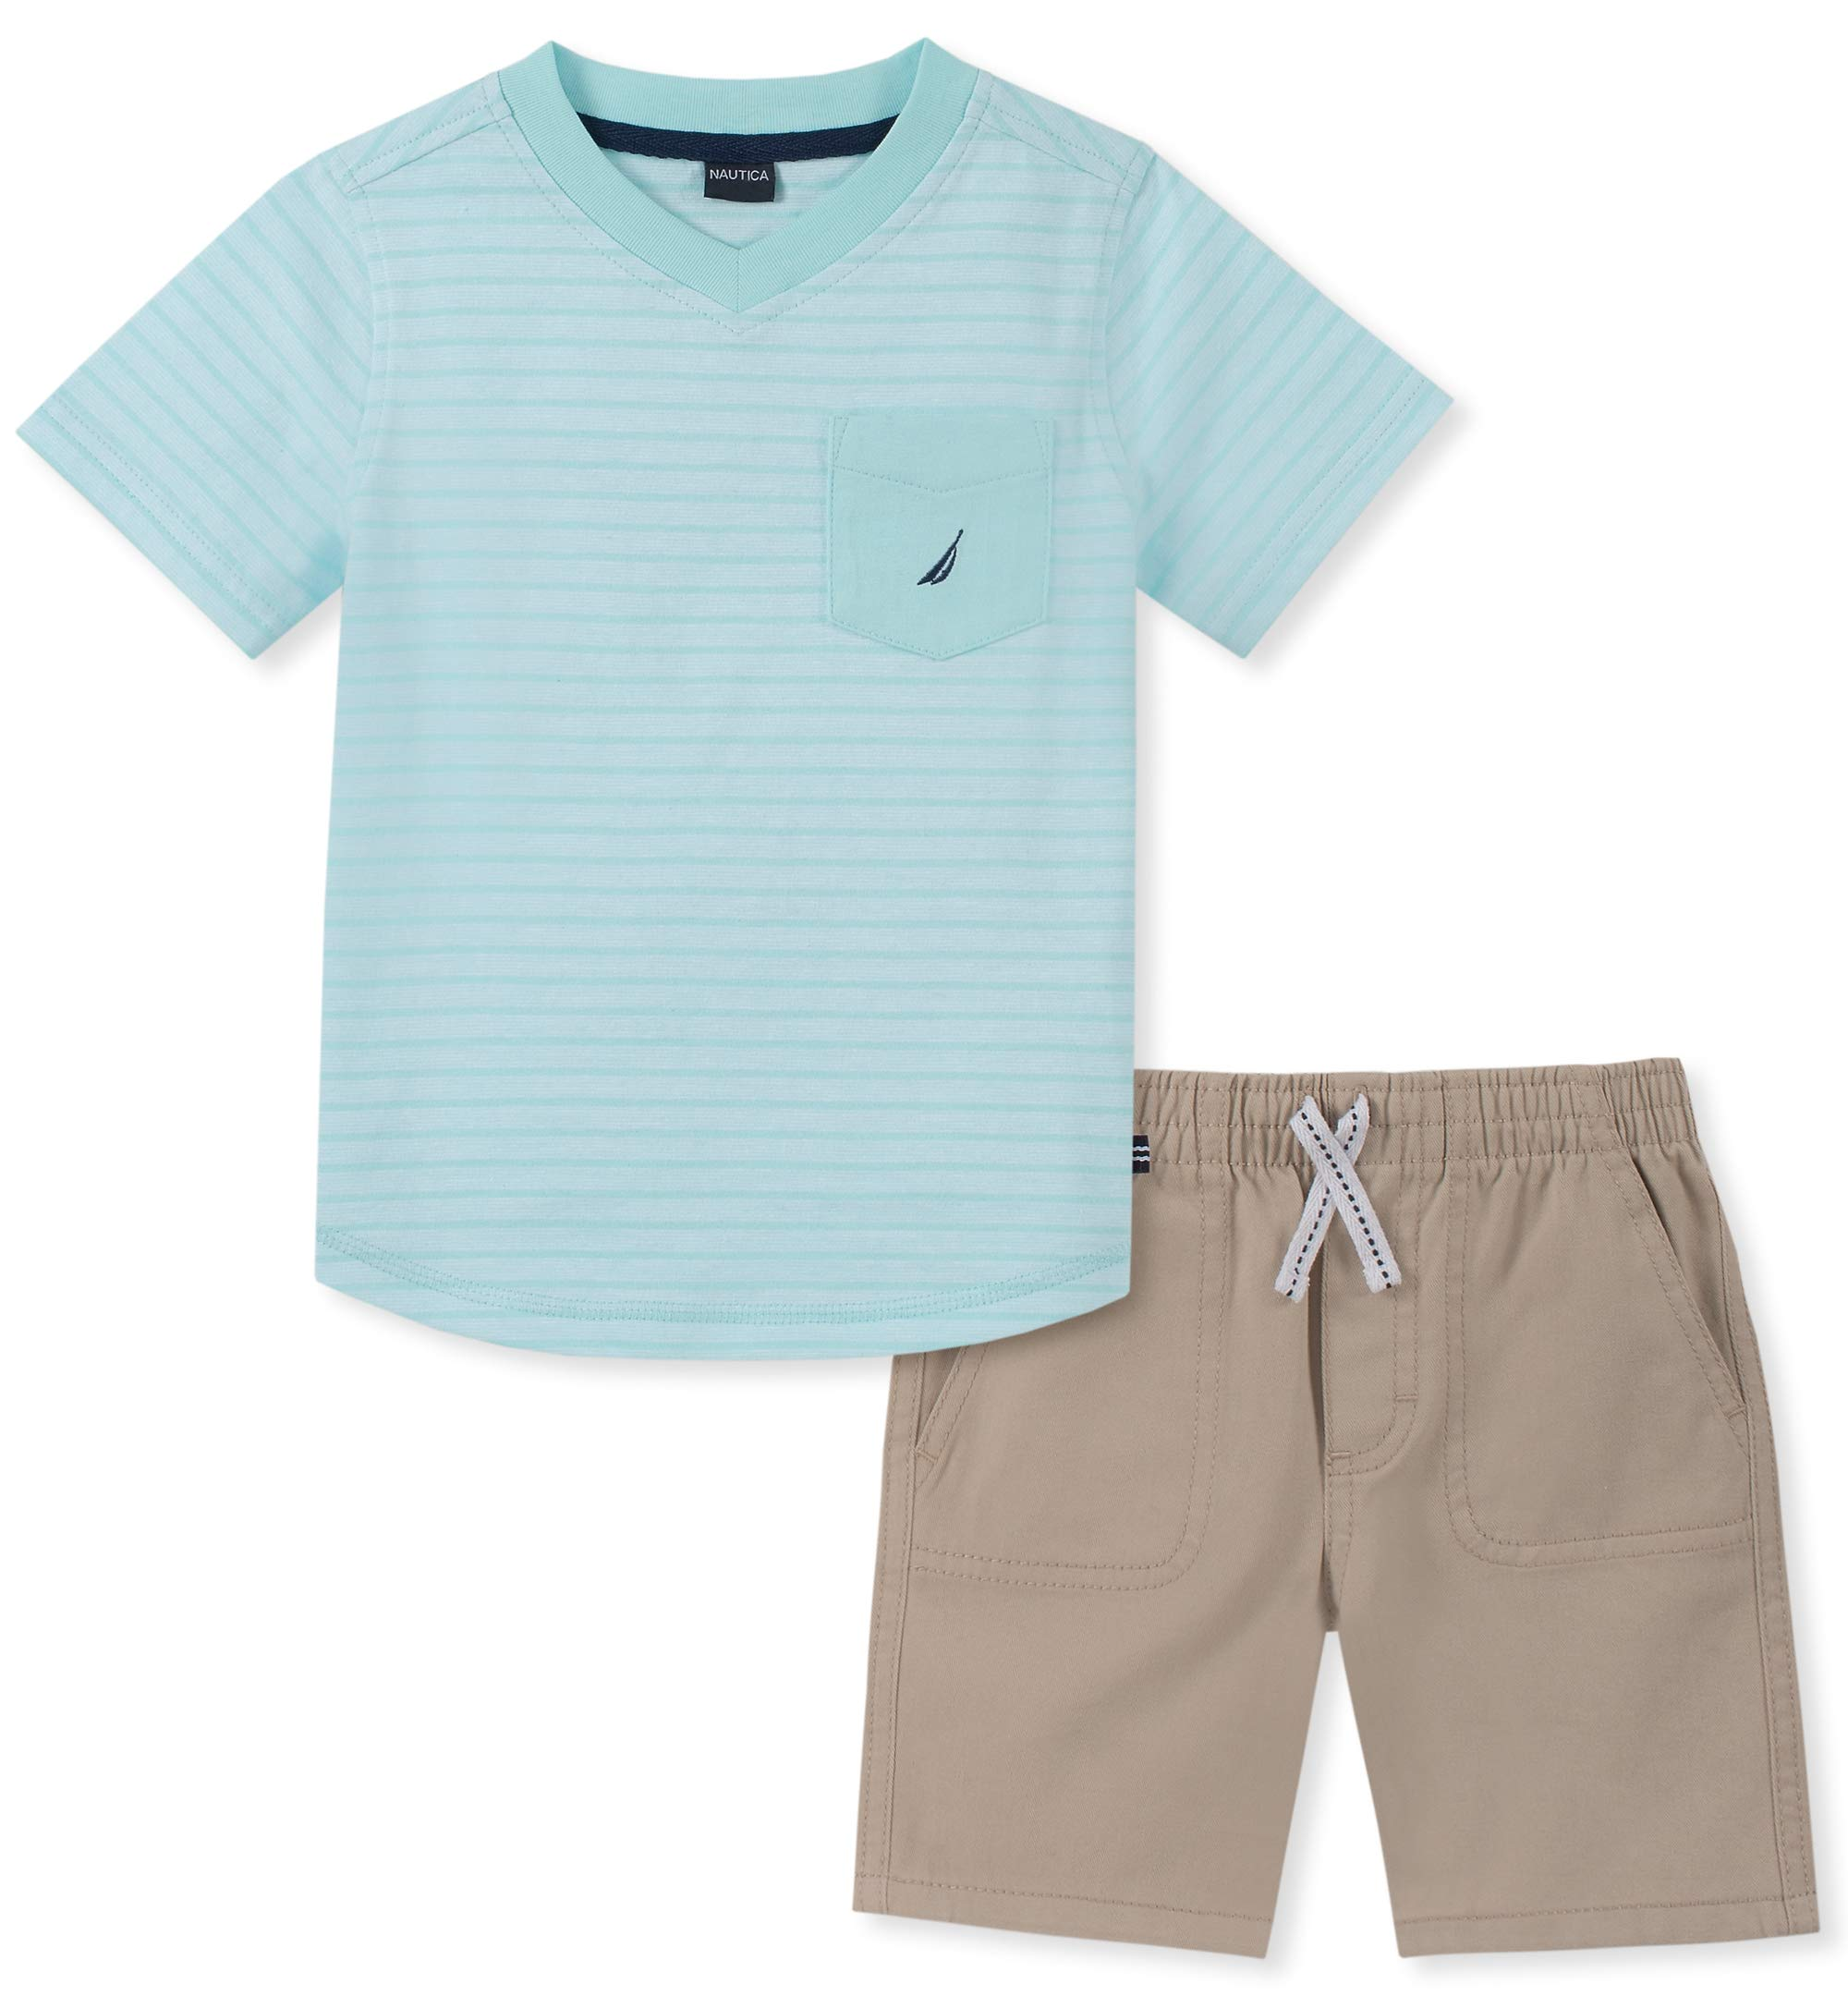 Nautica Sets (KHQ) Boys' Little 2 Pieces Tee Shorts Set, Green Stripes, 6